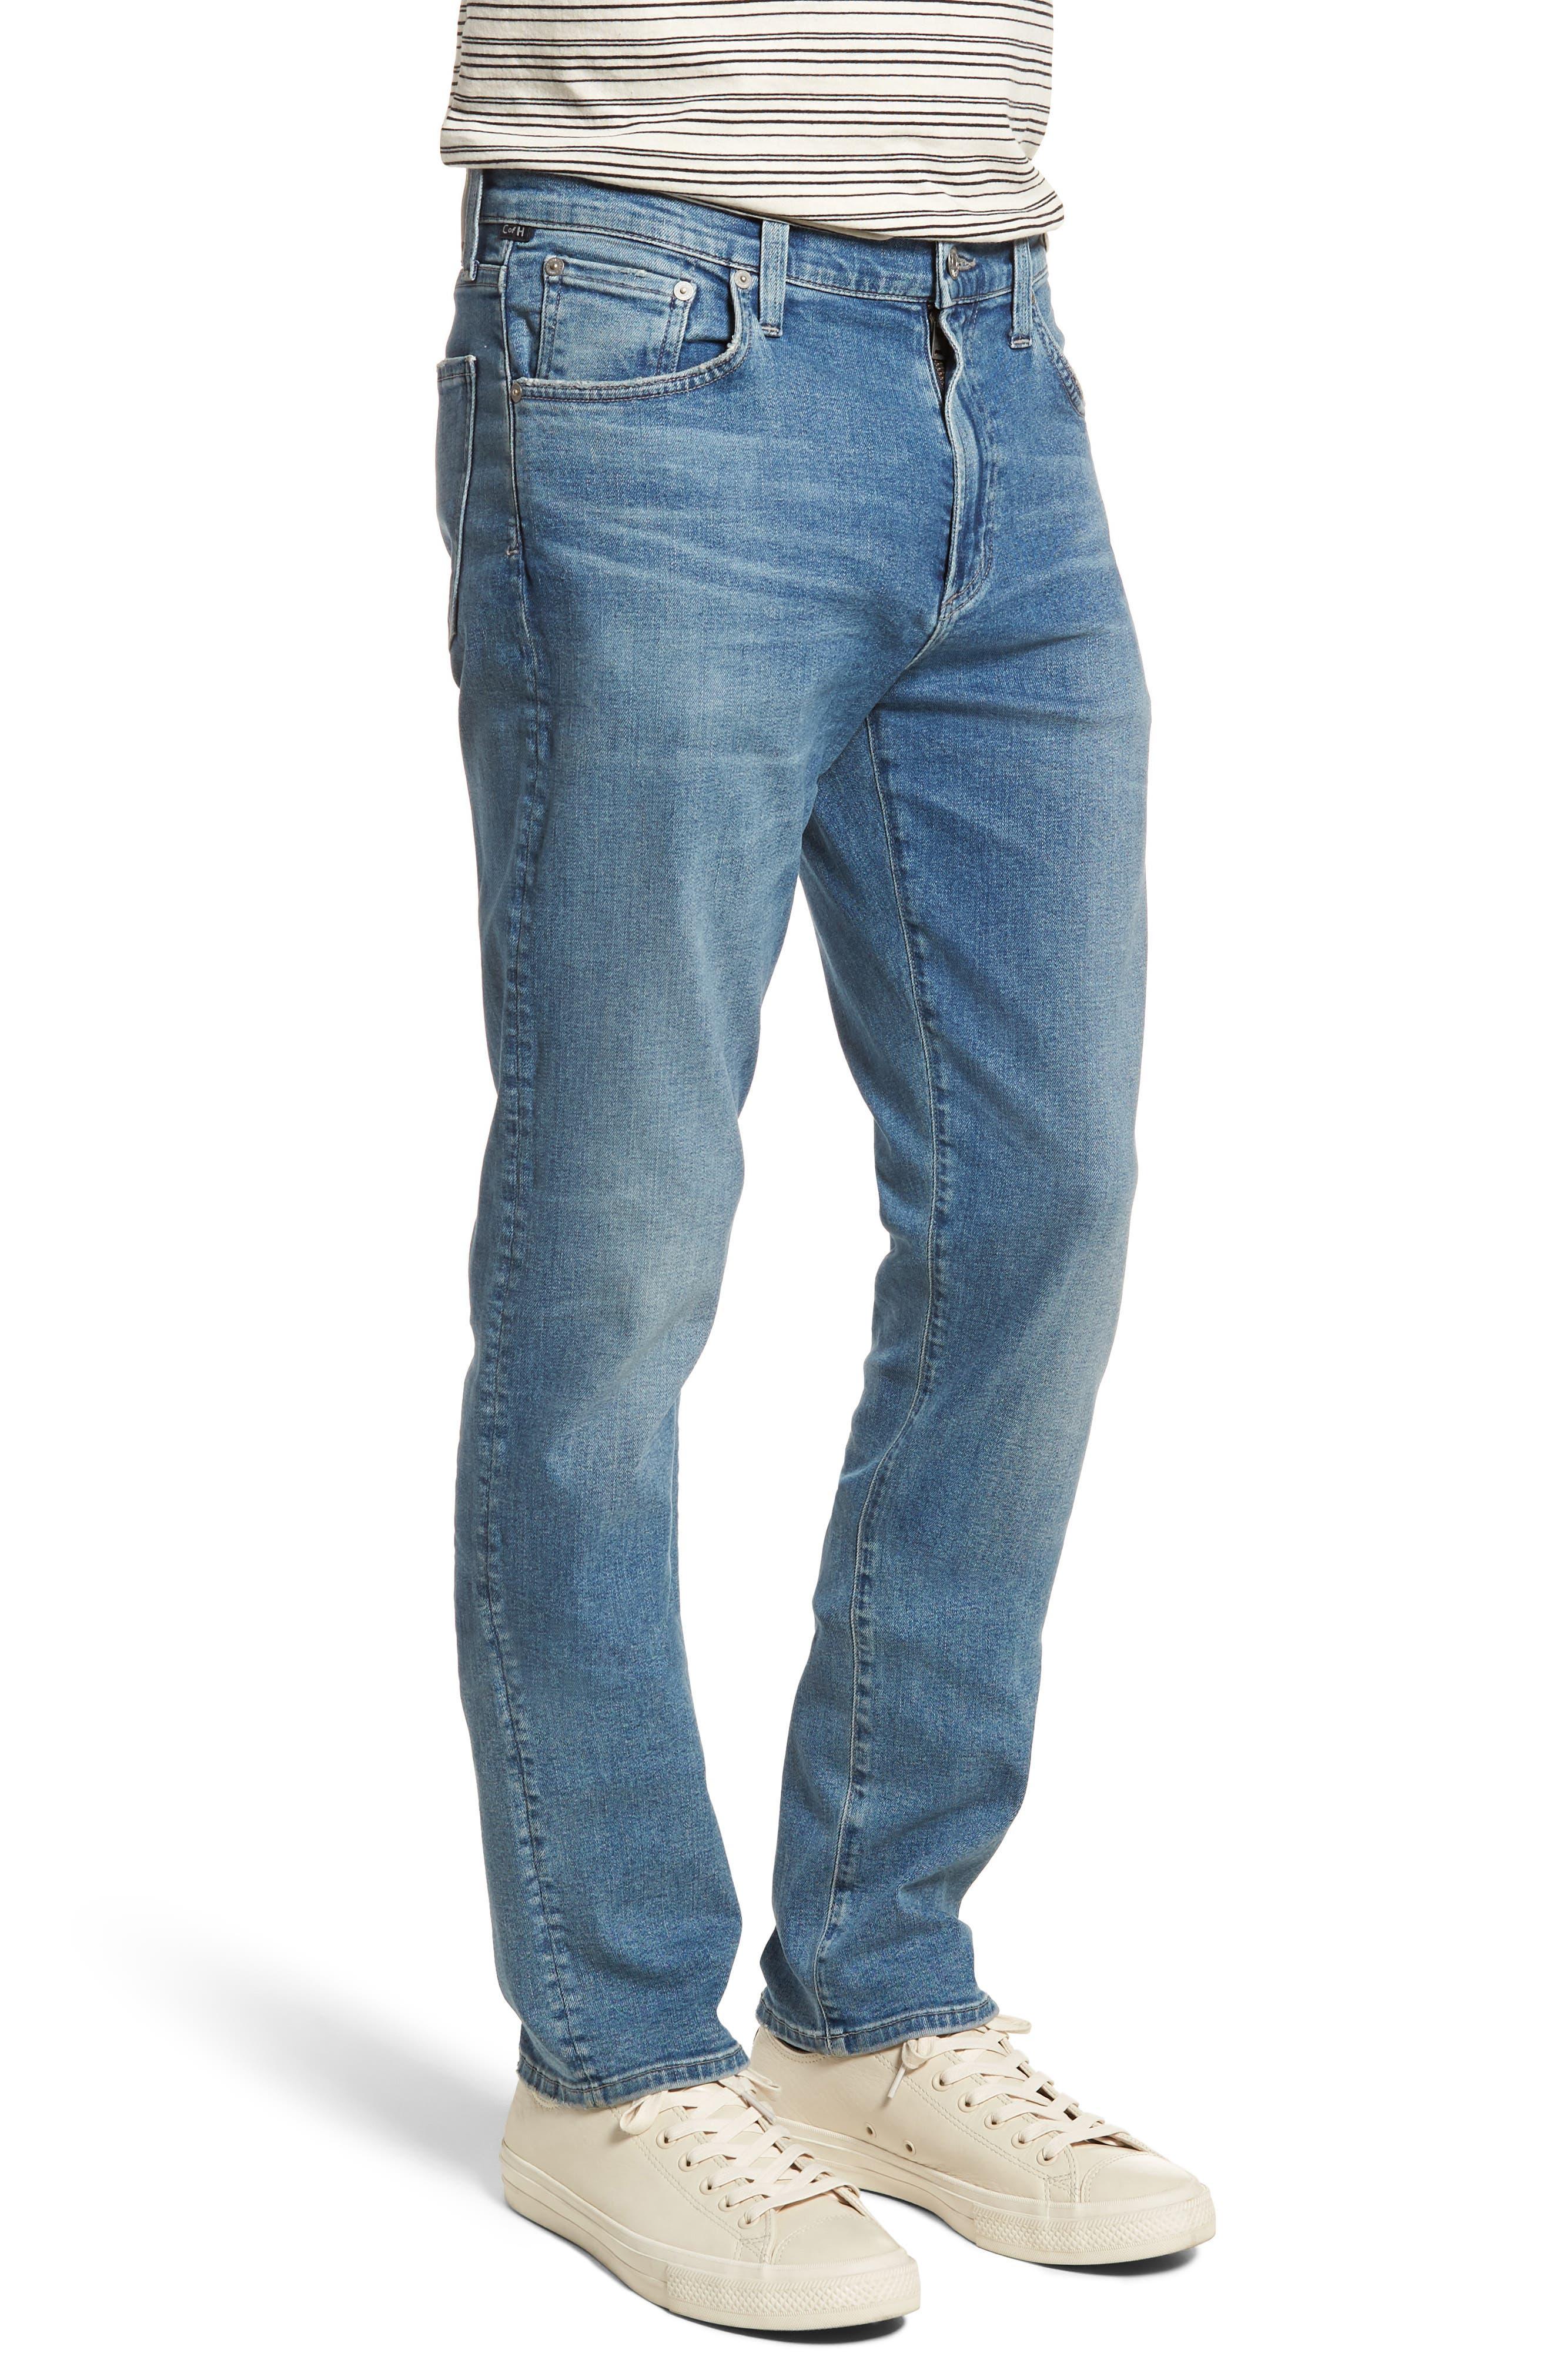 Perform - Gage Slim Straight Leg Jeans,                             Alternate thumbnail 3, color,                             473